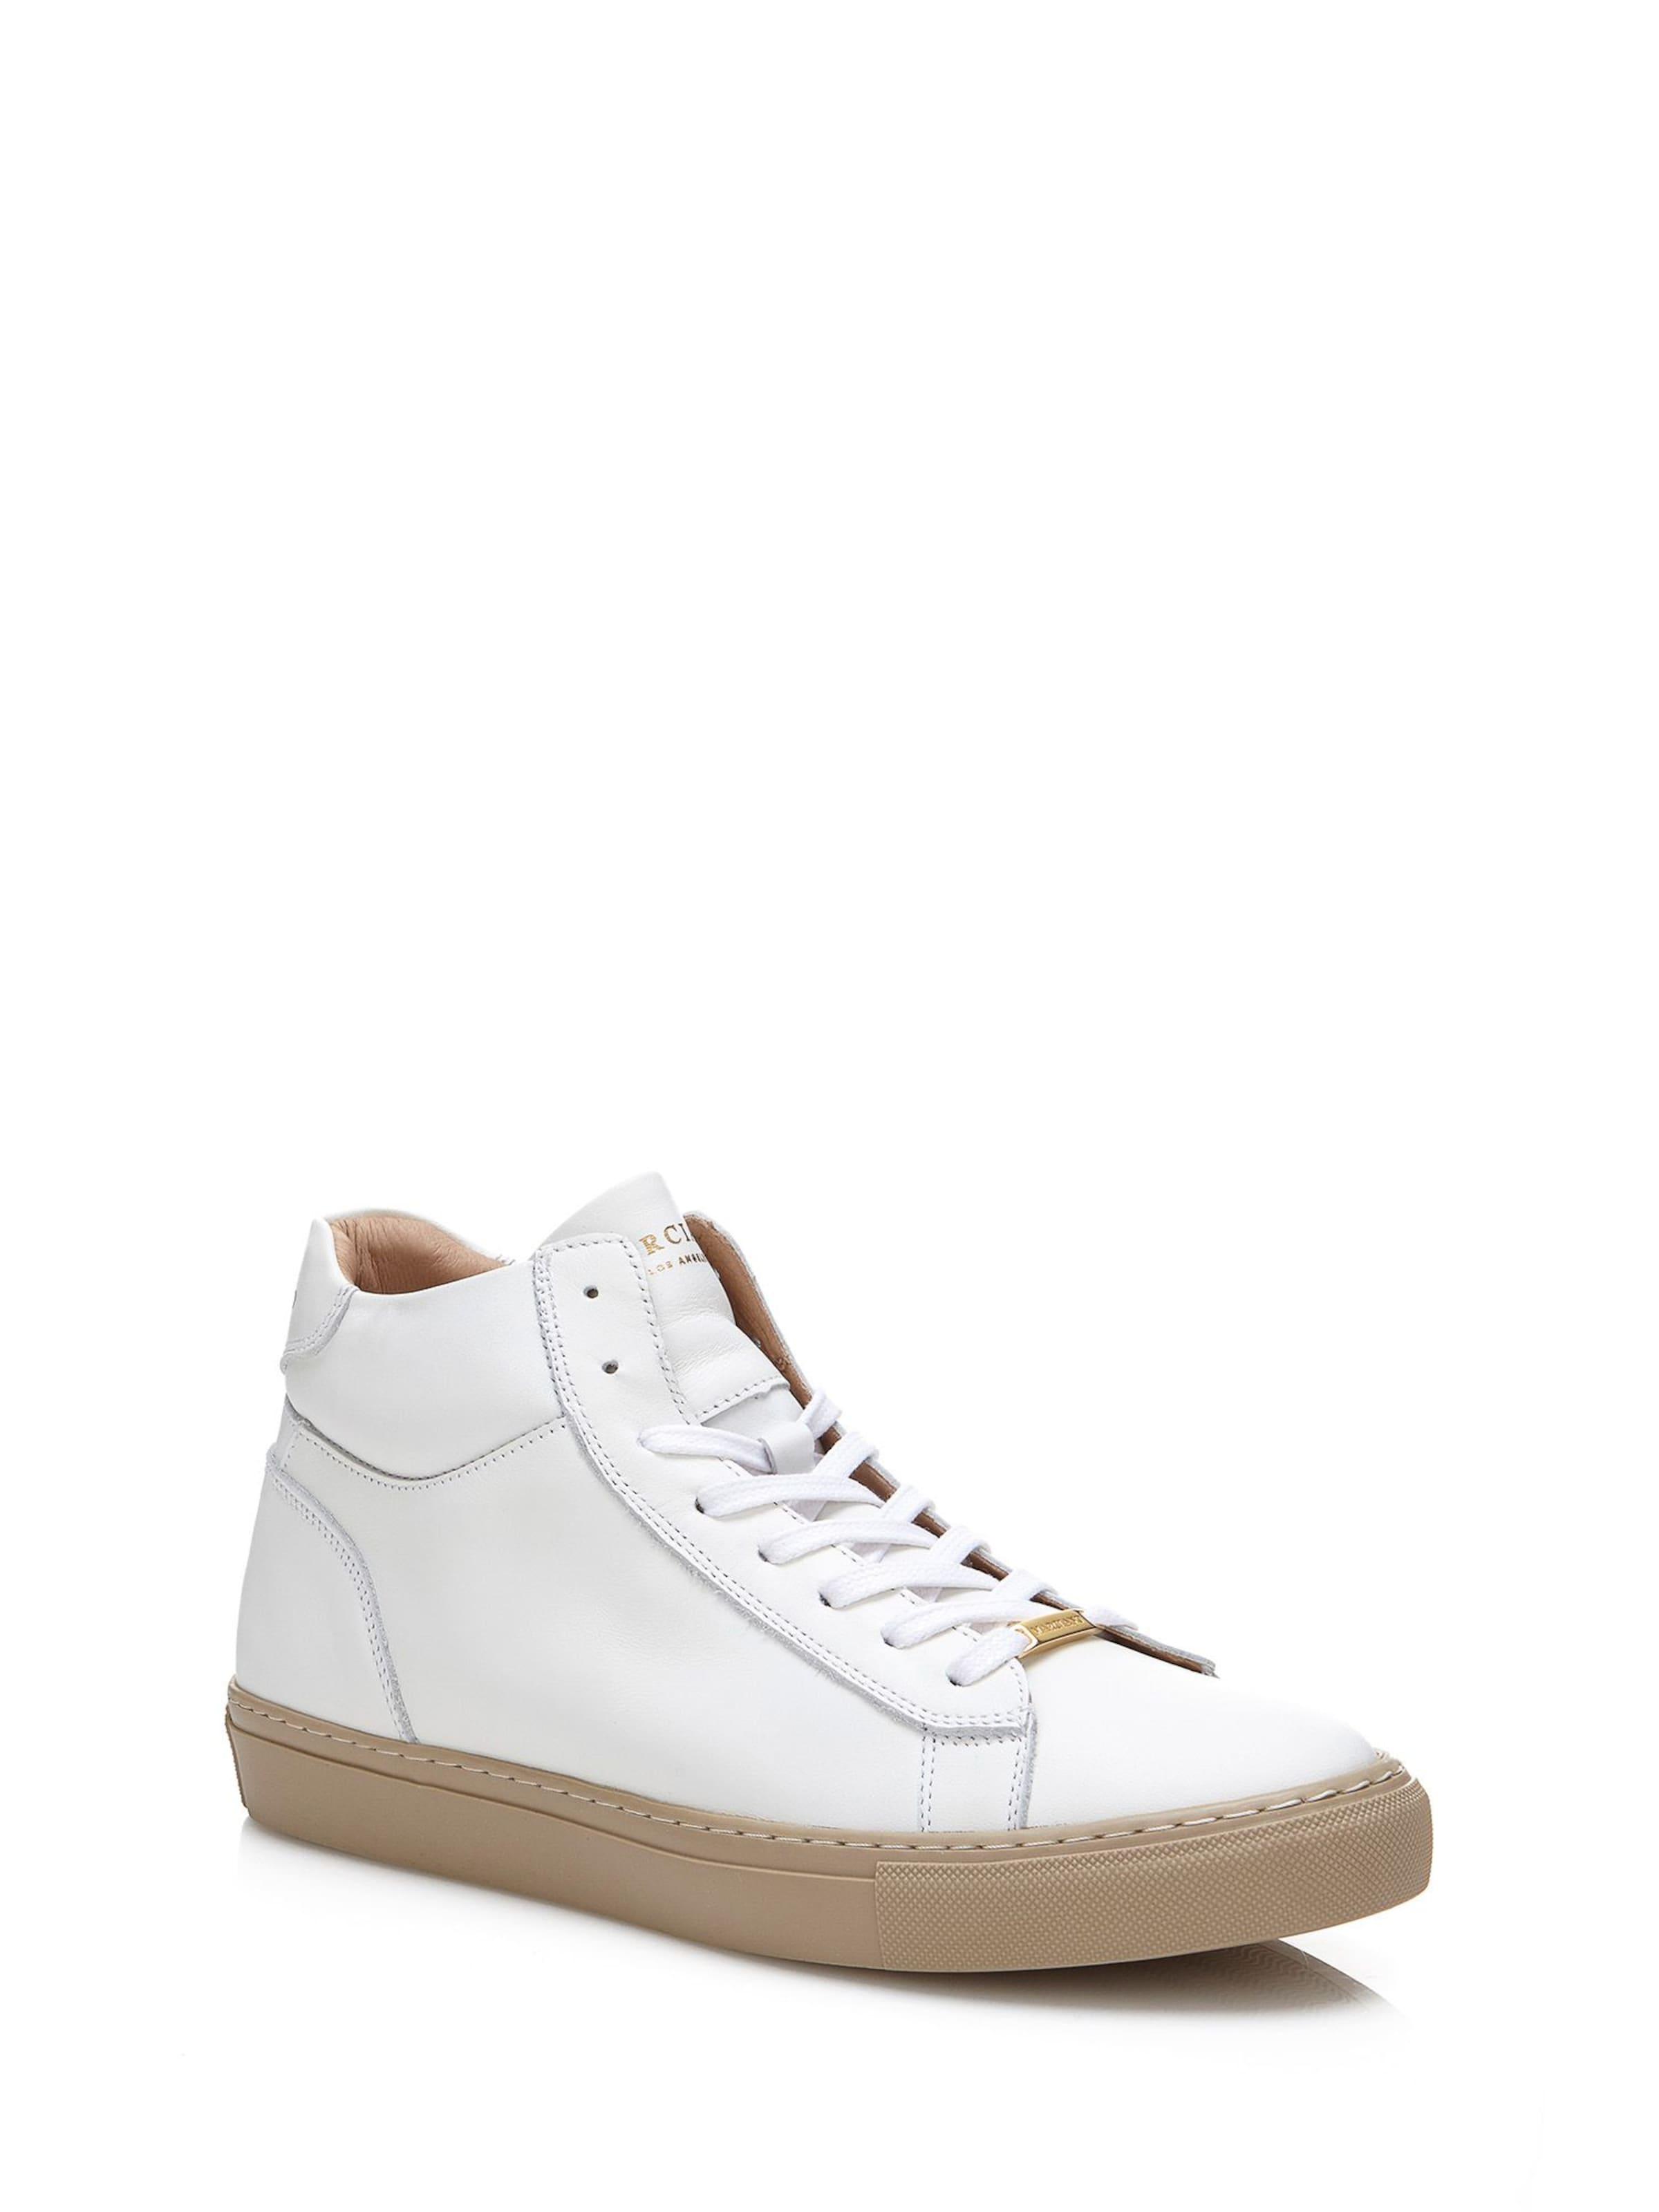 MARCIANO LOS ANGELES SNEAKER Verschleißfeste billige Schuhe